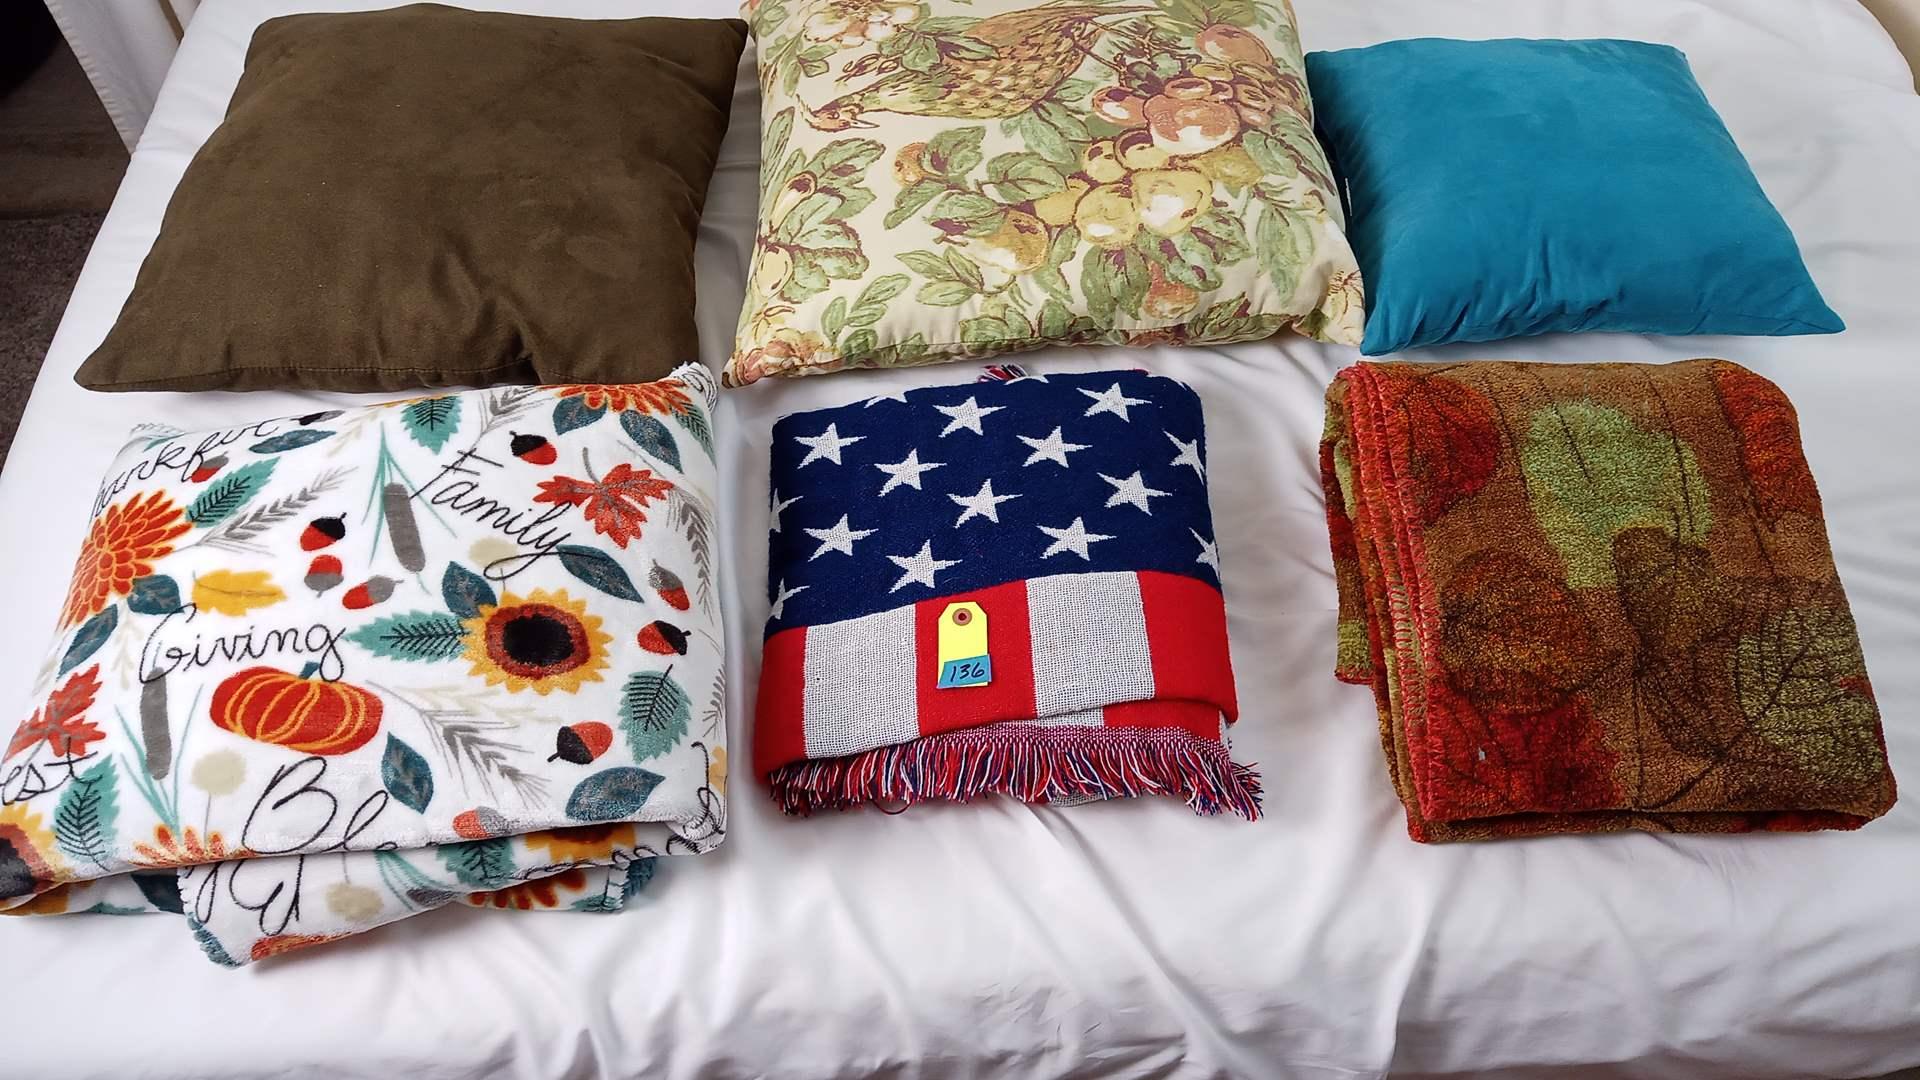 Lot # 136 Home Decor: 3 Pillows & 3 Blankets, USA Flag Blanket etc